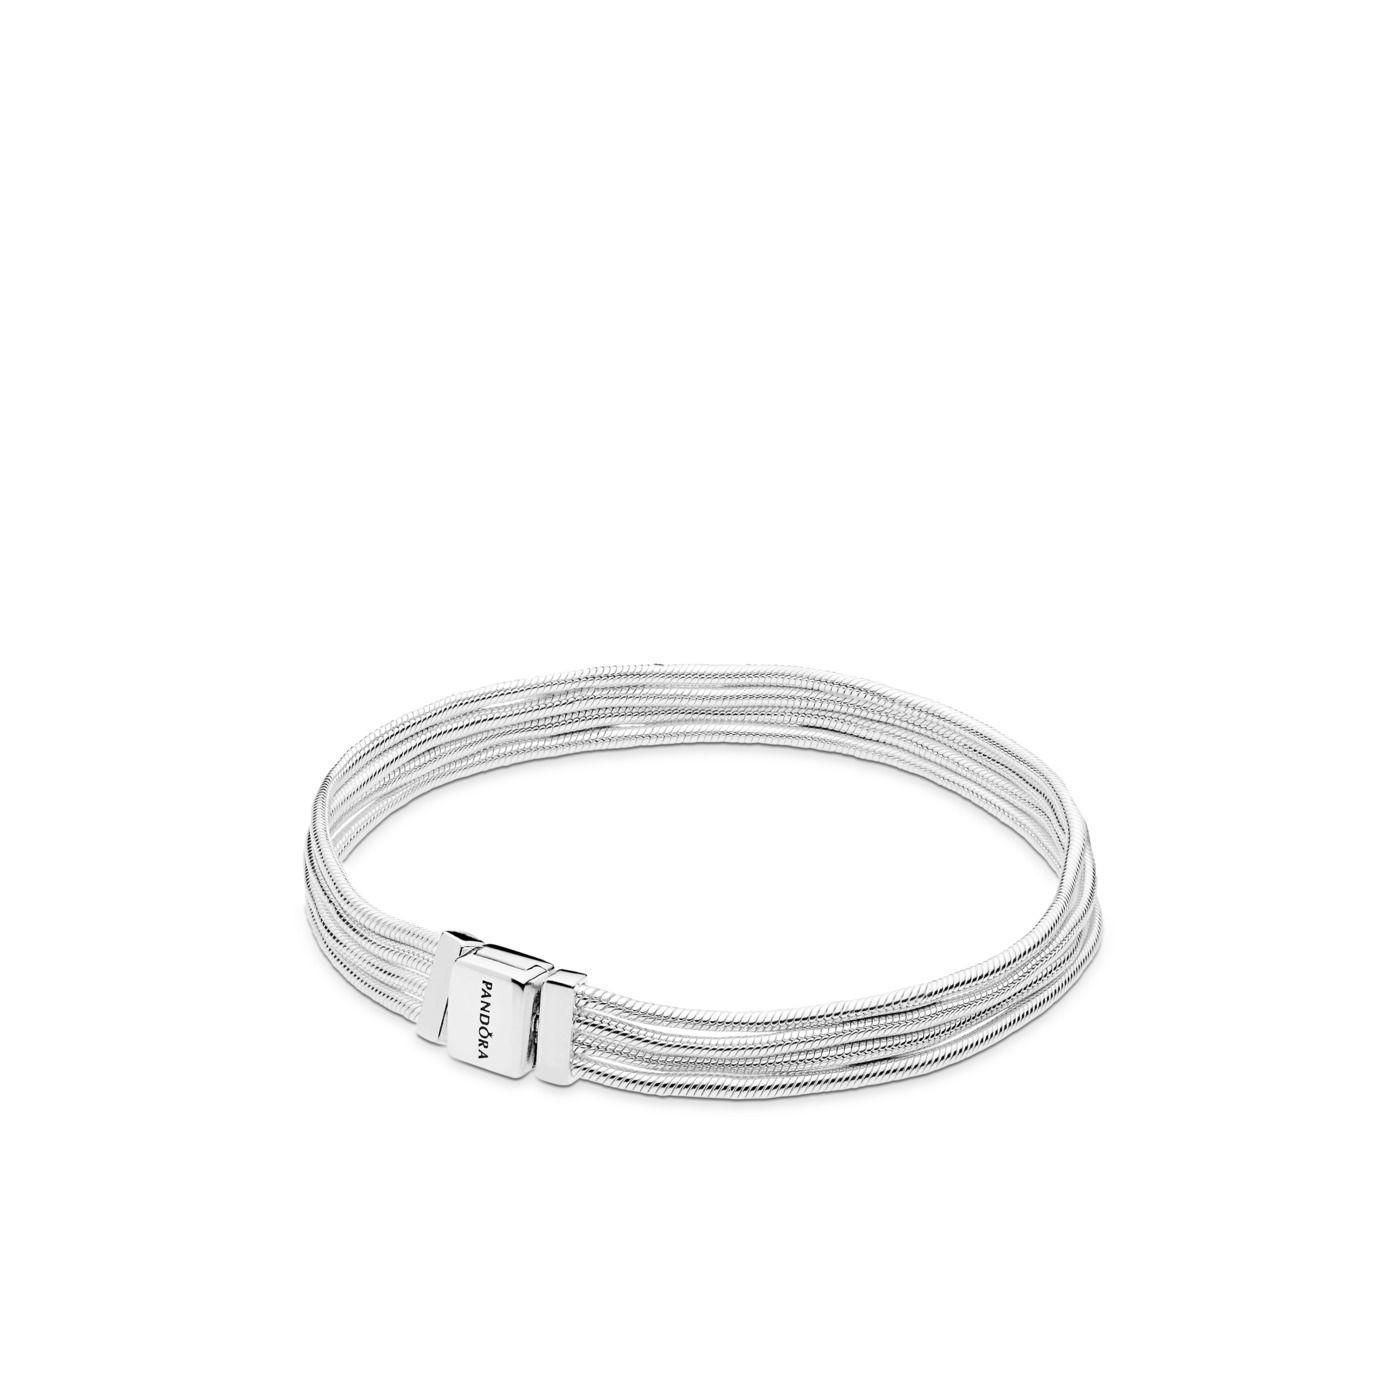 Pandora Reflexions 925 Sterling Zilveren Multi Snake Chain Armband 597943 (Lengte: 16.00-19.00 cm)